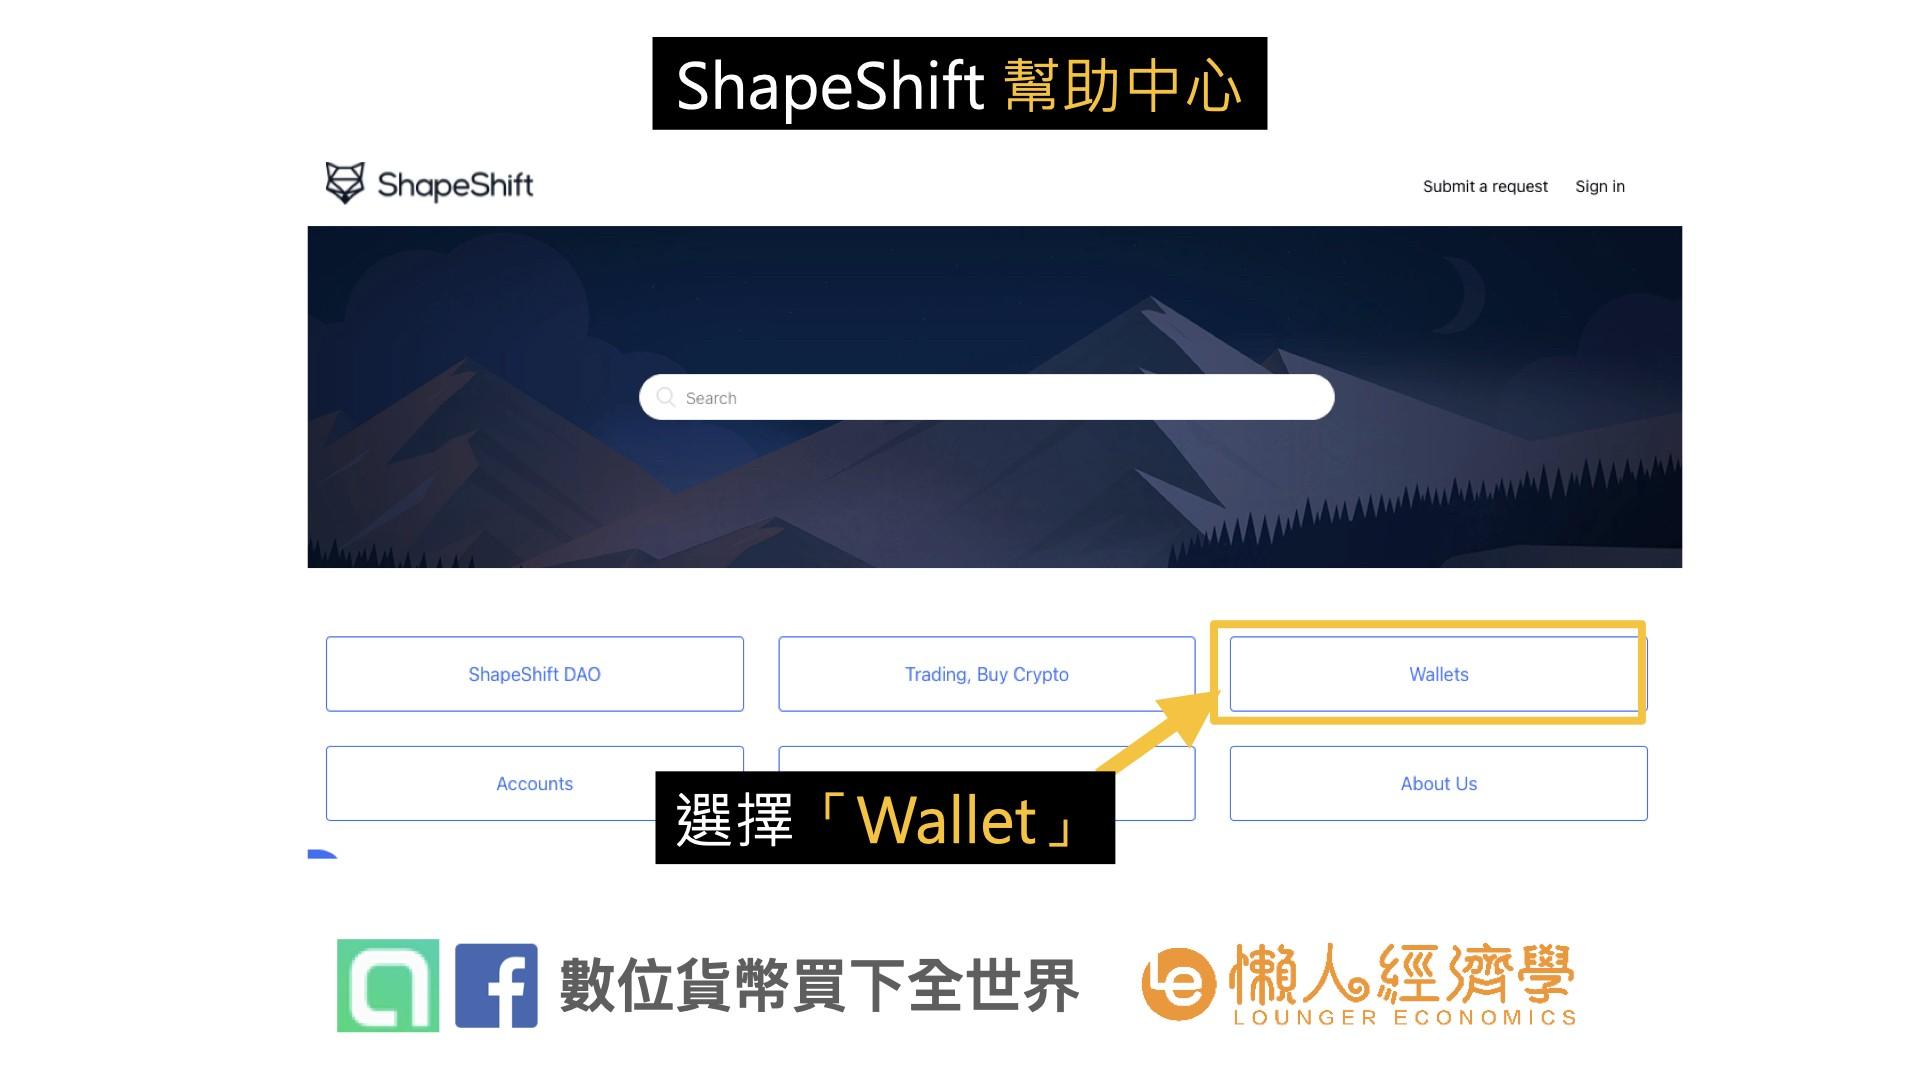 KeepKey 客服:ShapeShift幫助中心